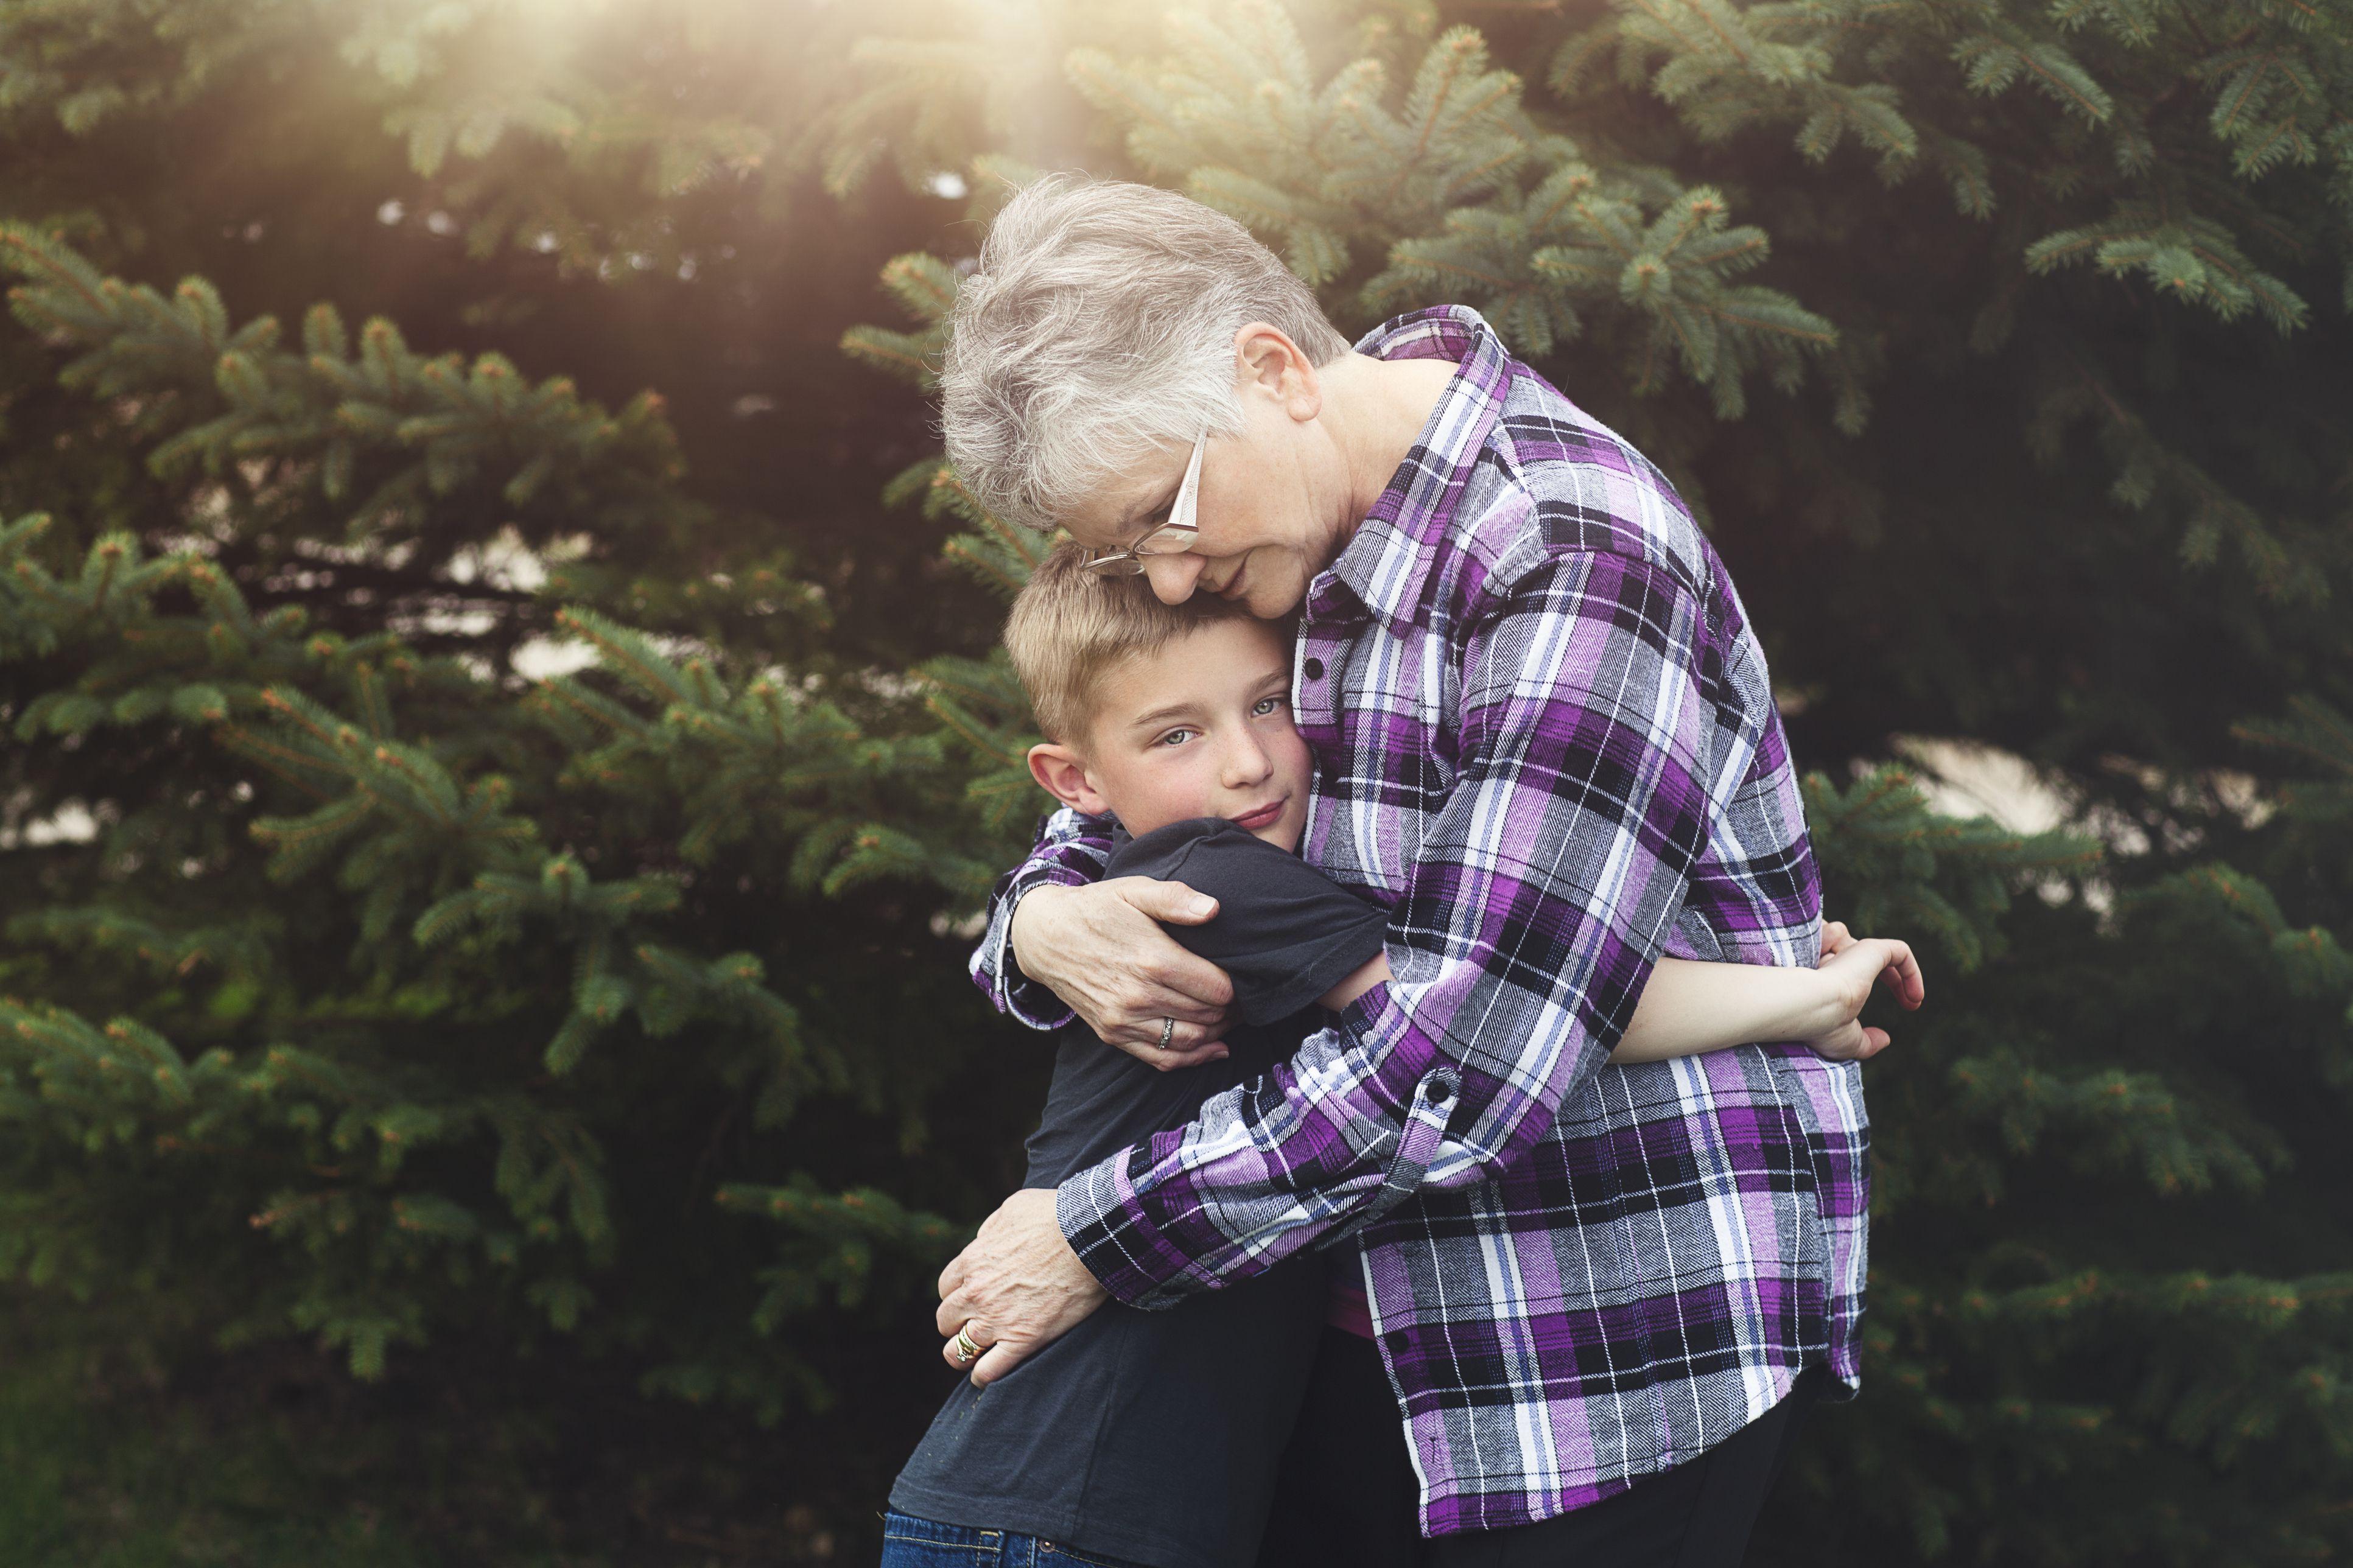 grandmother and grandson embracing